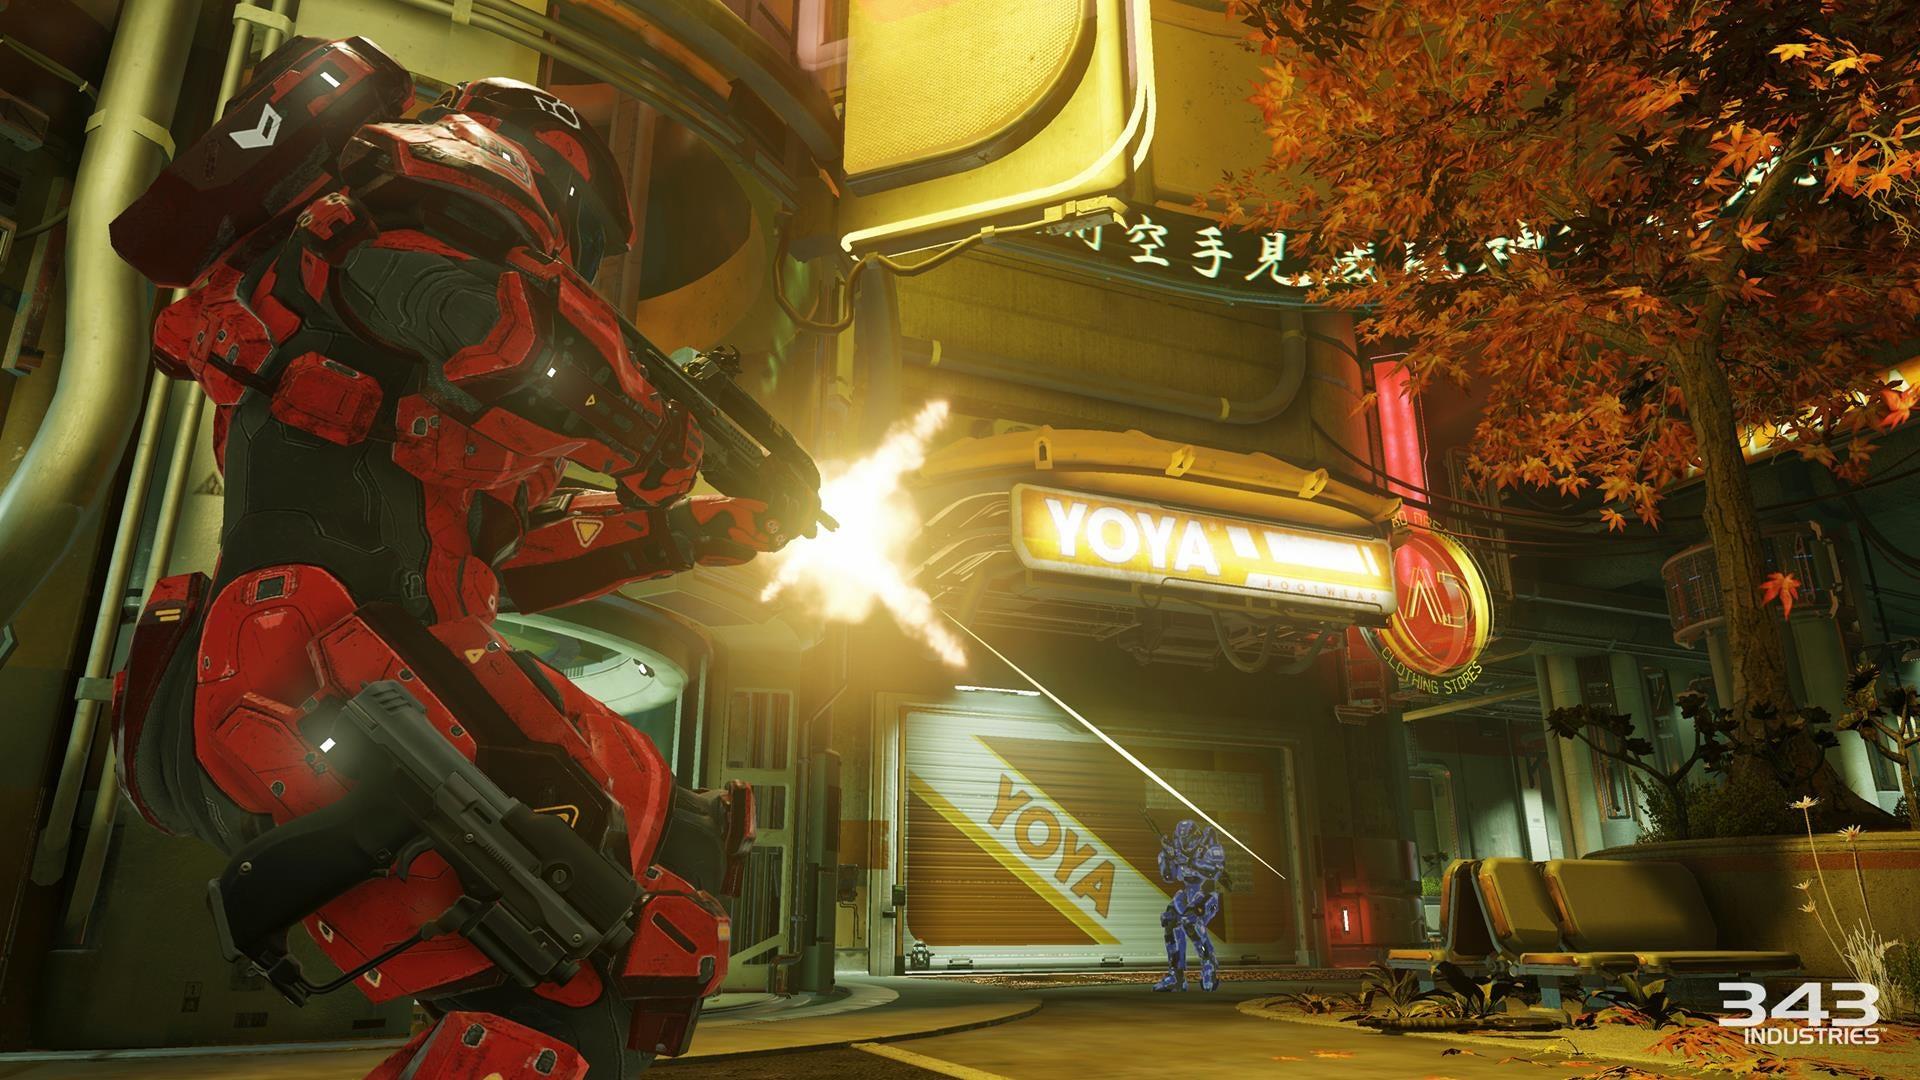 Image for Xbox Live deals: Halo 5, Star Wars Battlefront, and 100% off Battlefield DLC